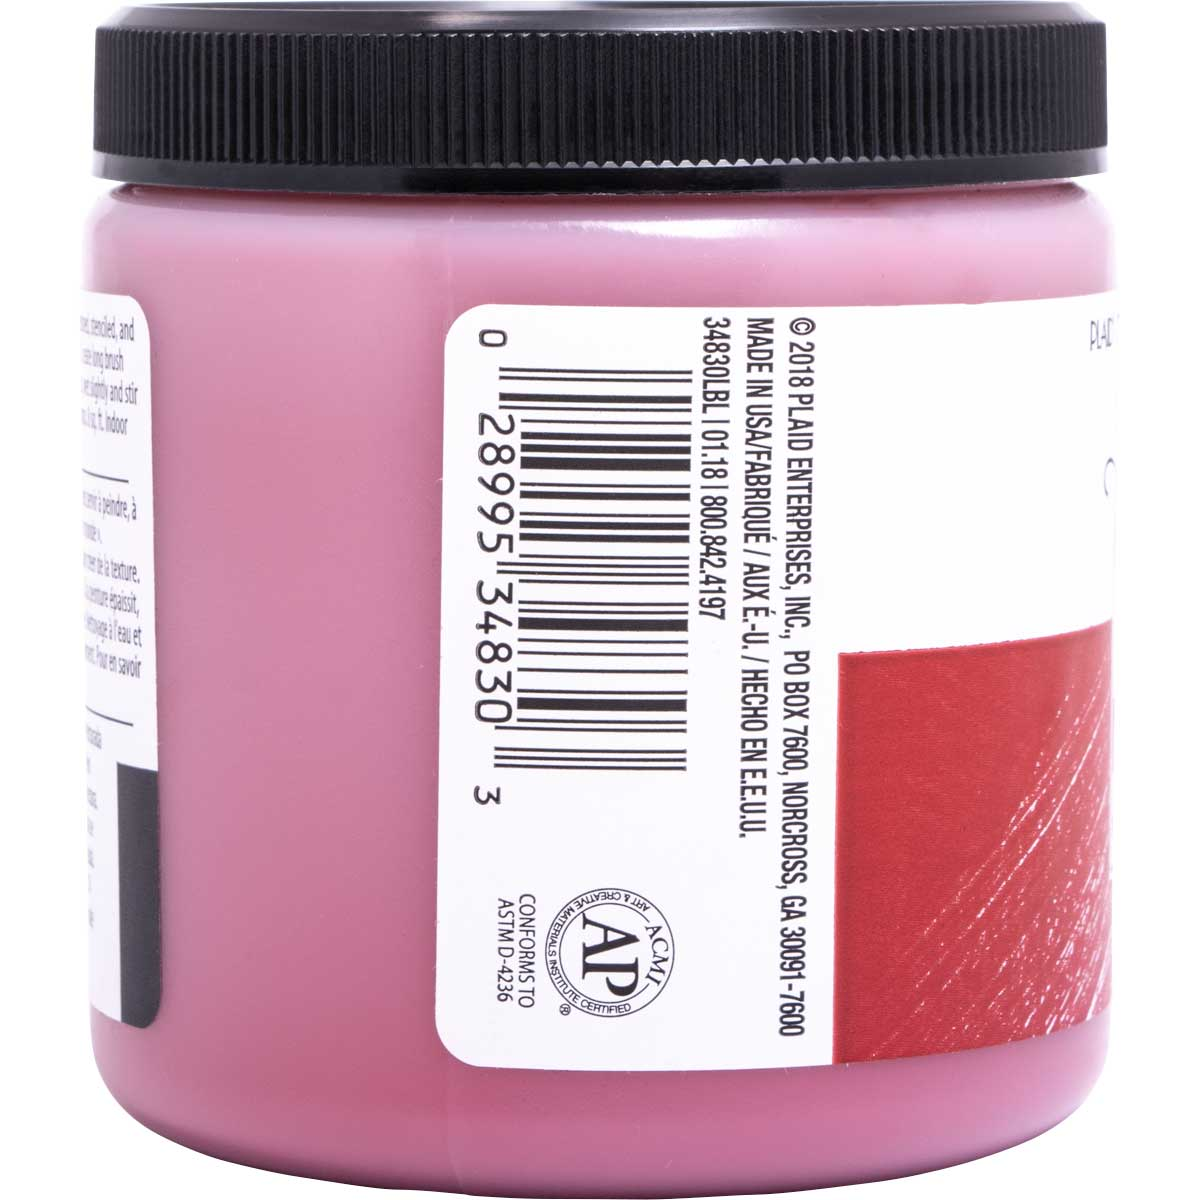 FolkArt ® Home Decor ® Texture Chalk™ - Barn Door, 8 oz. - 34830